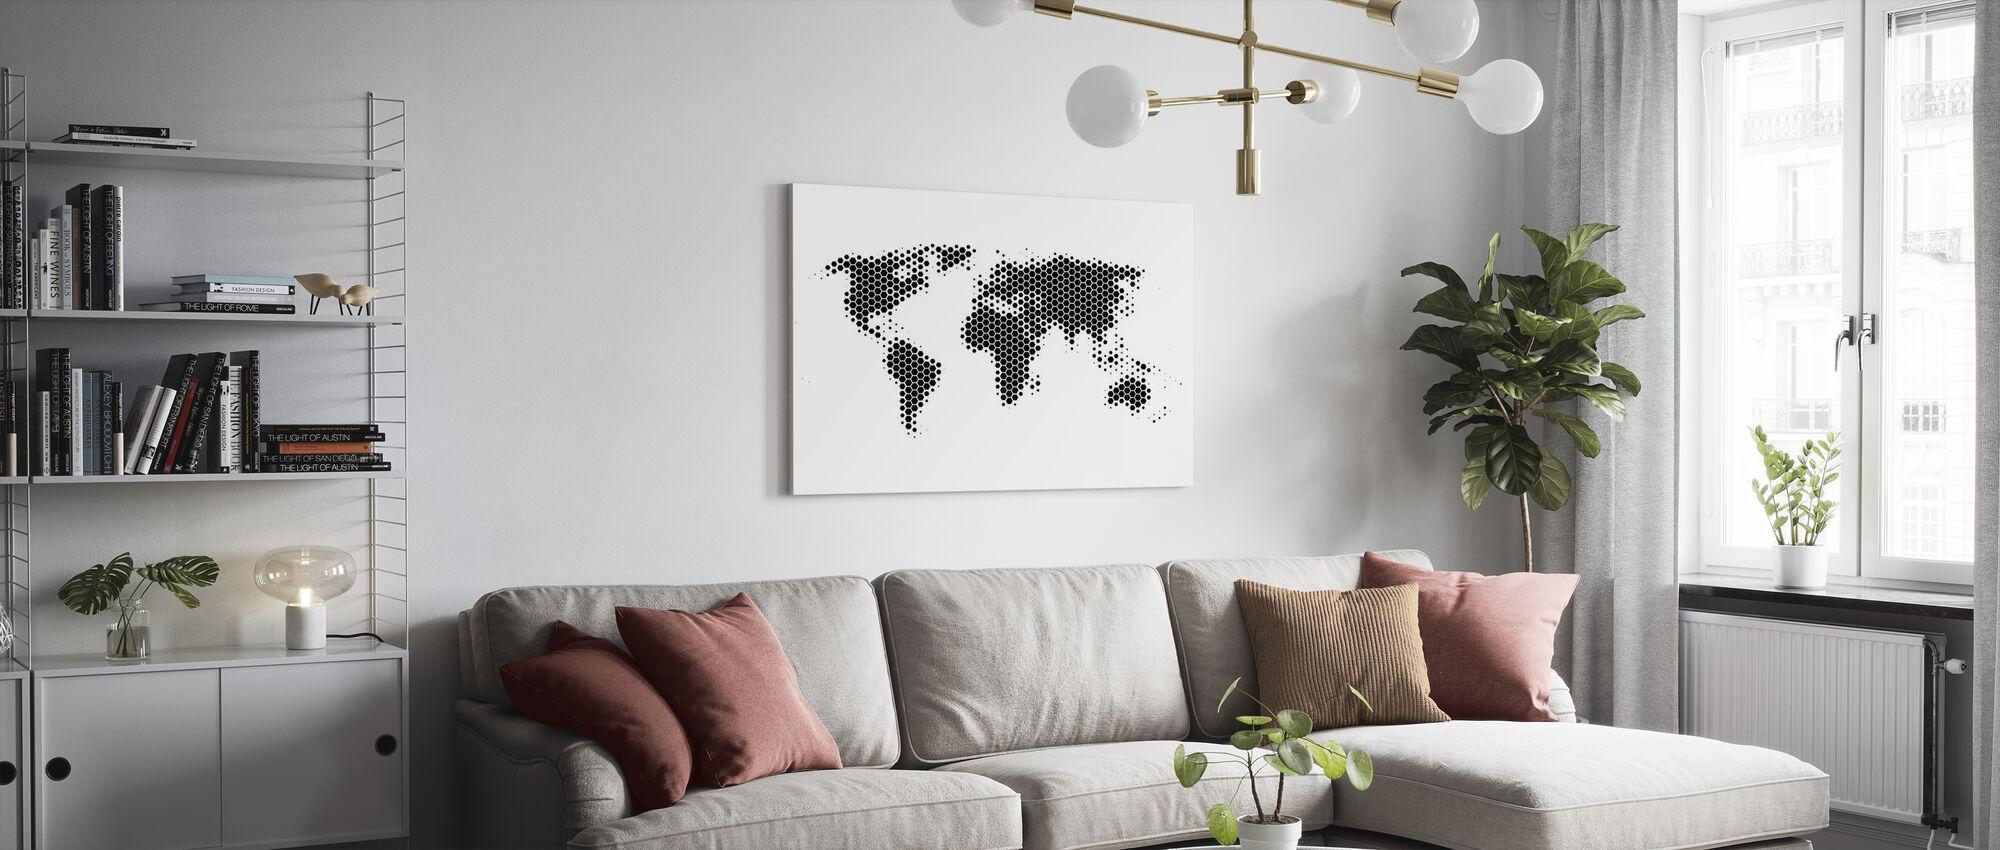 Världskarta metallplåt - Svart - Canvastavla - Vardagsrum